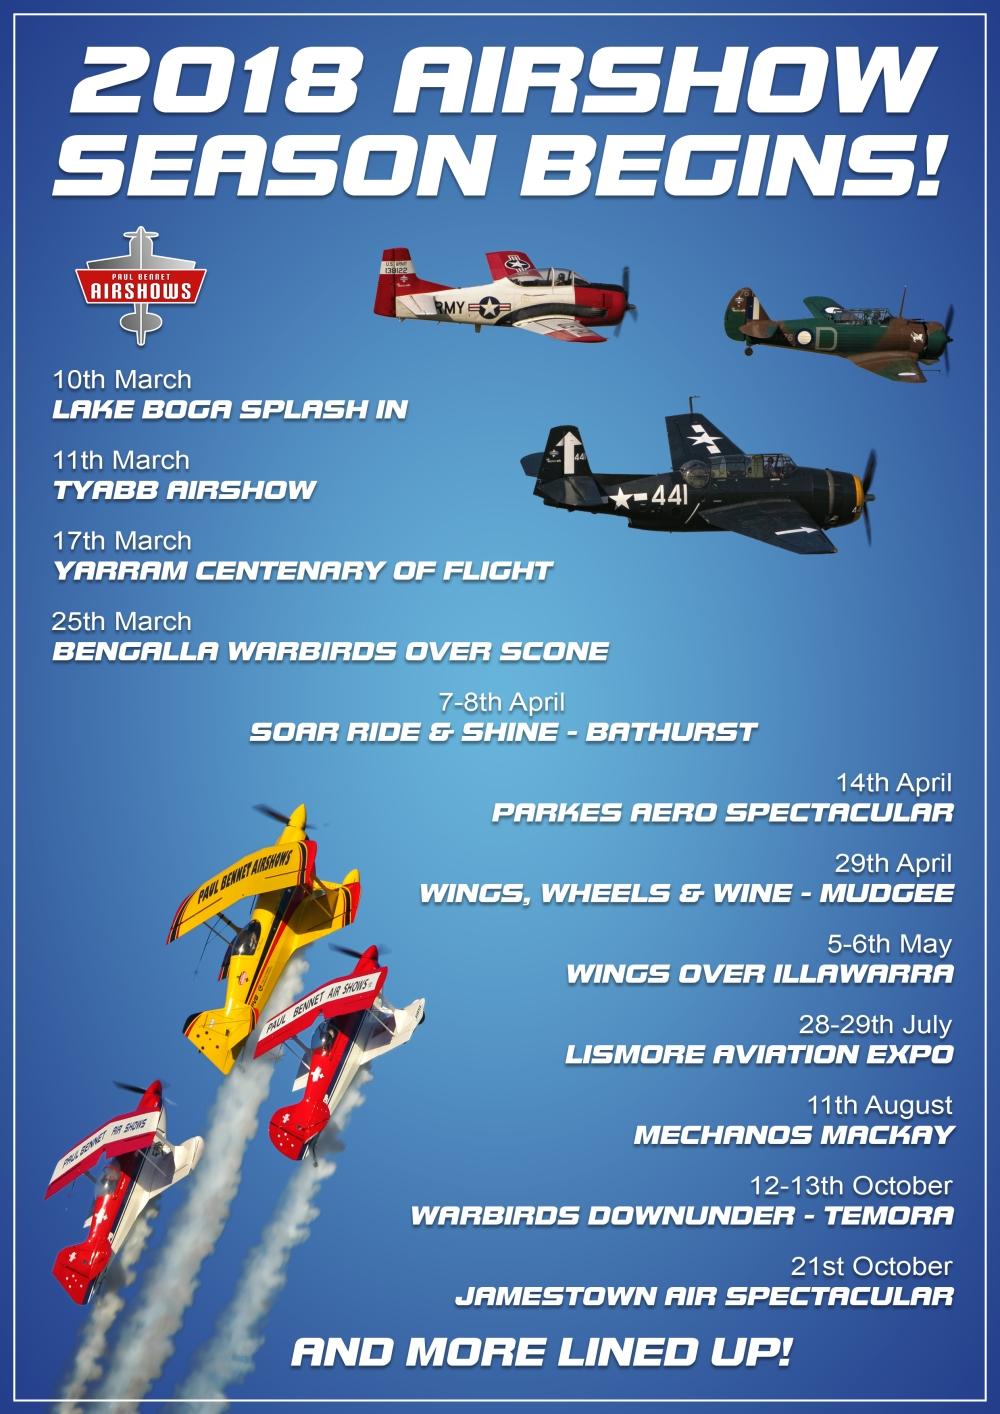 Airshow Season Begins v2.2